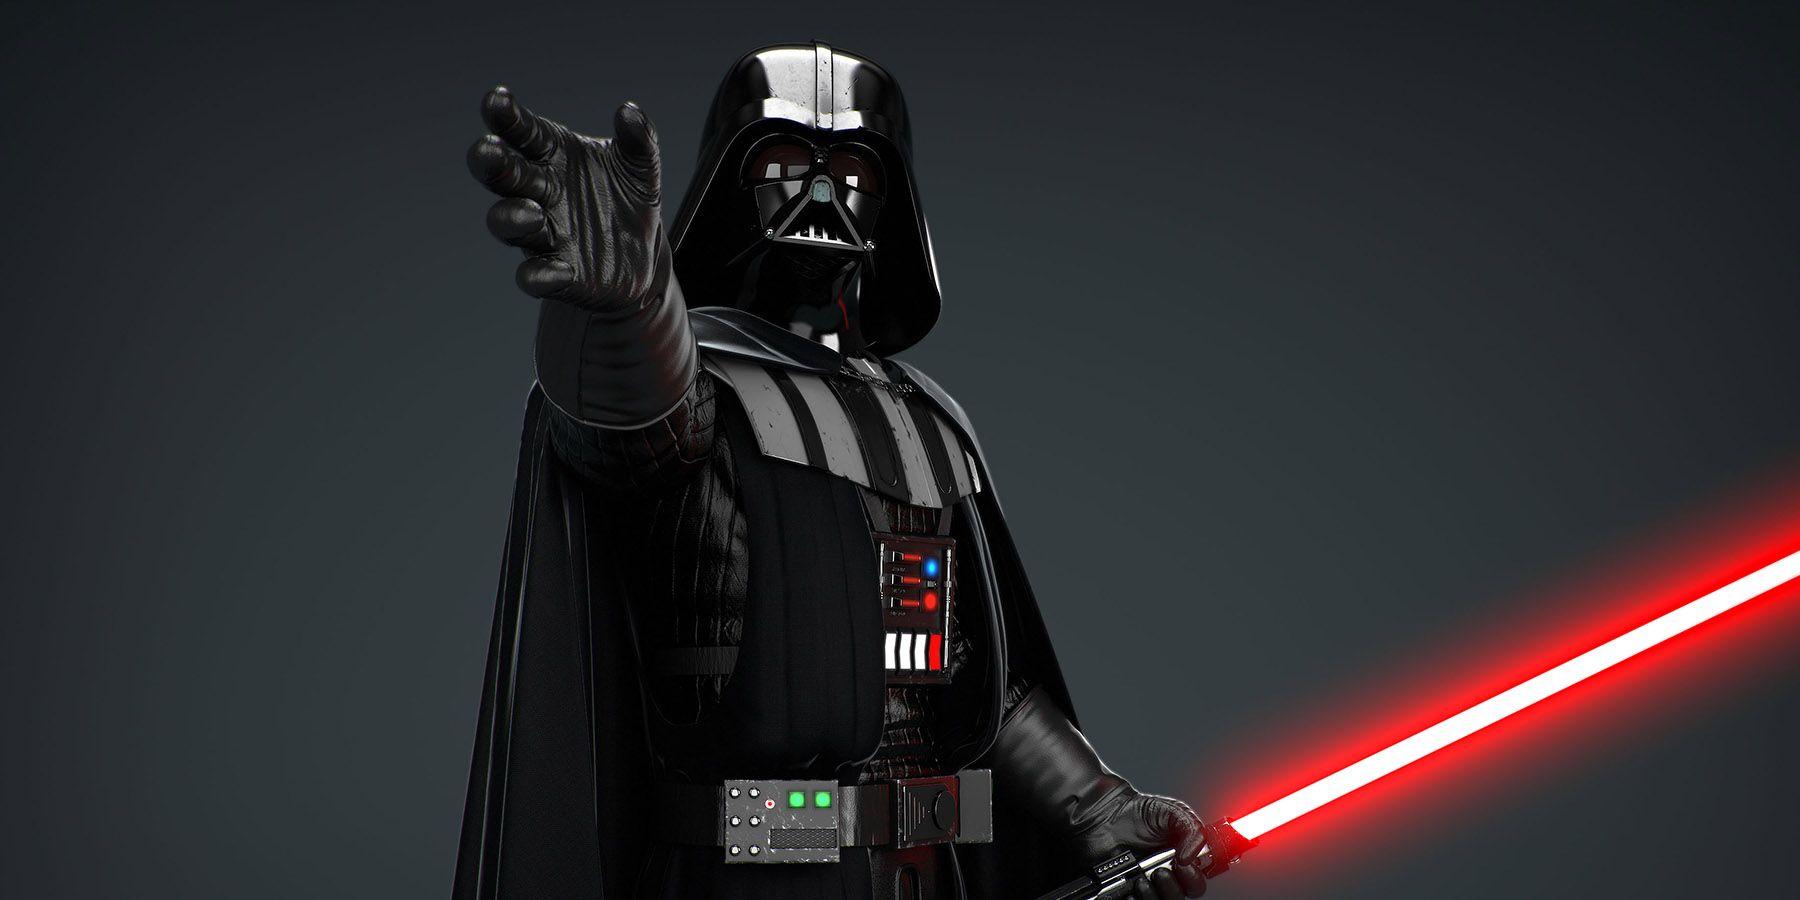 https://static0.srcdn.com/wp-content/uploads/Star-Wars-Darth-Vader-Wallpaper.jpg